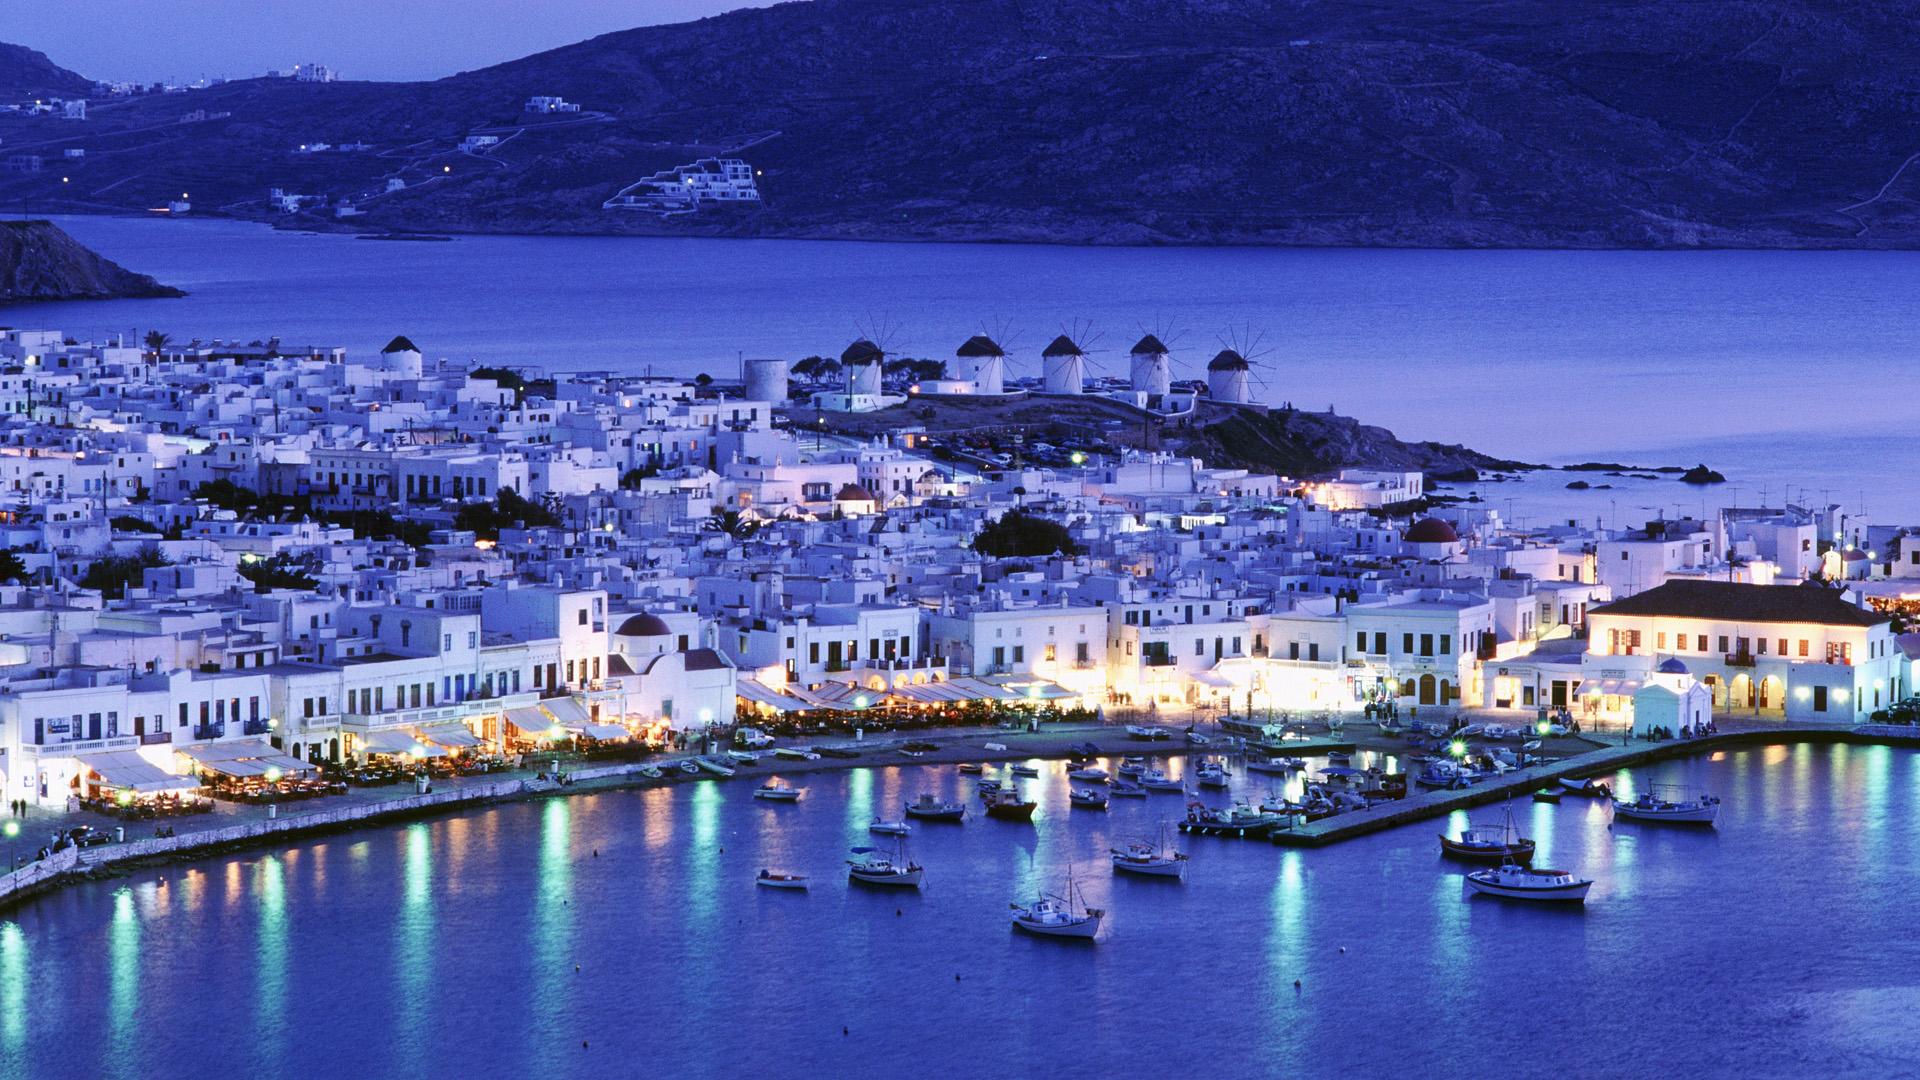 Mykonos Town, Mykonos, Greece --- Mykonos --- Image by © ML Sinibaldi/CORBIS